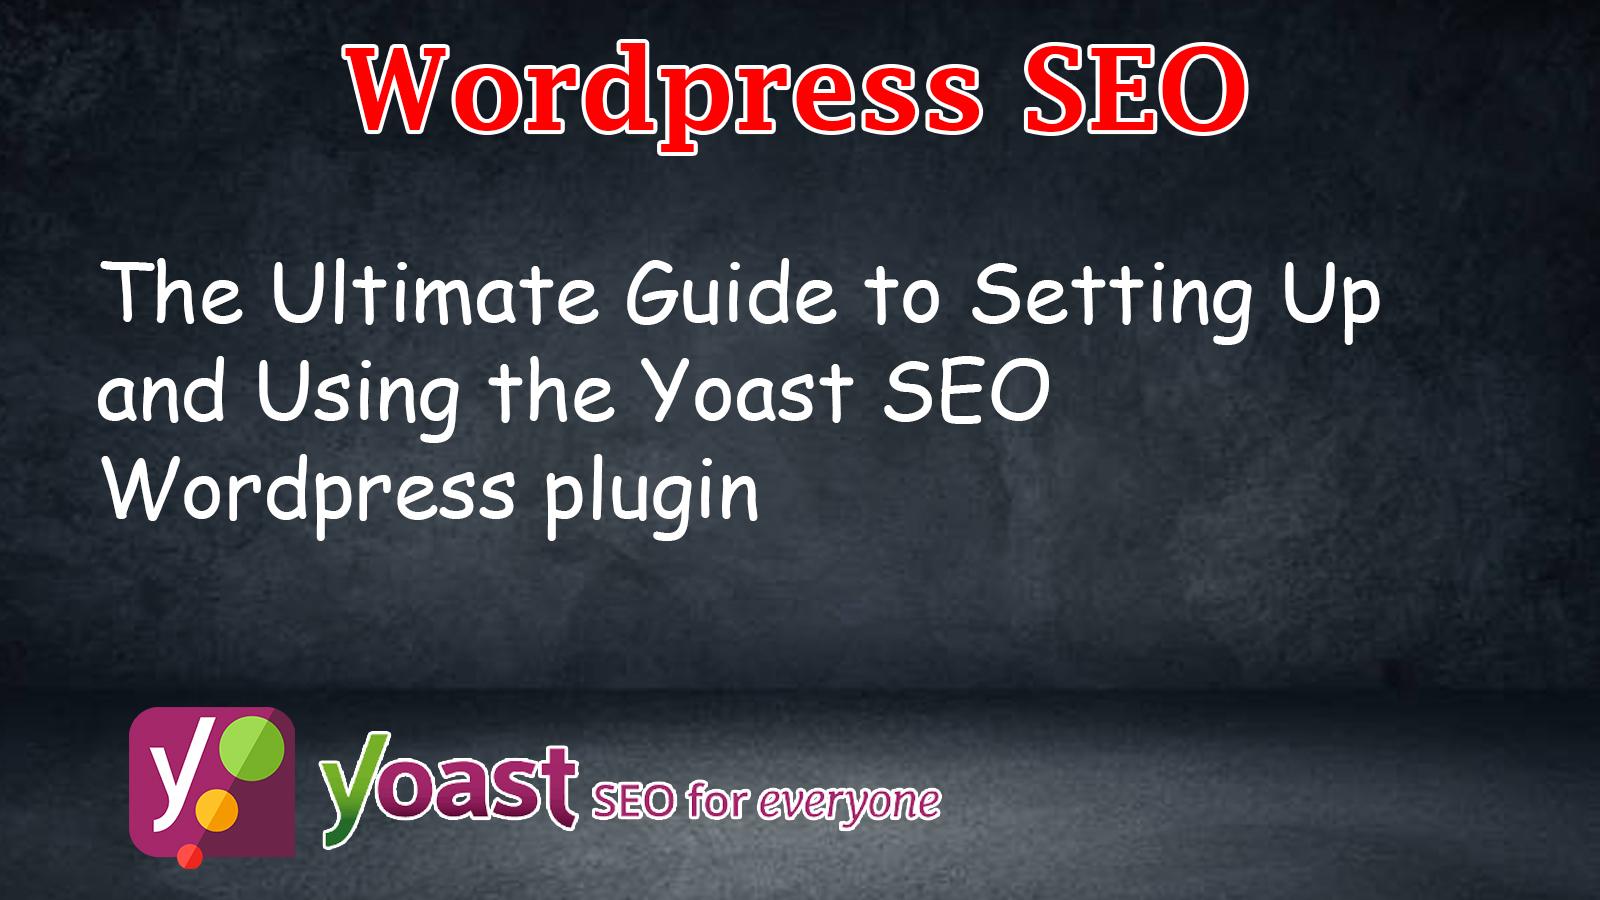 I will do yoast wordpress ON page SEO with yoast premium plugin